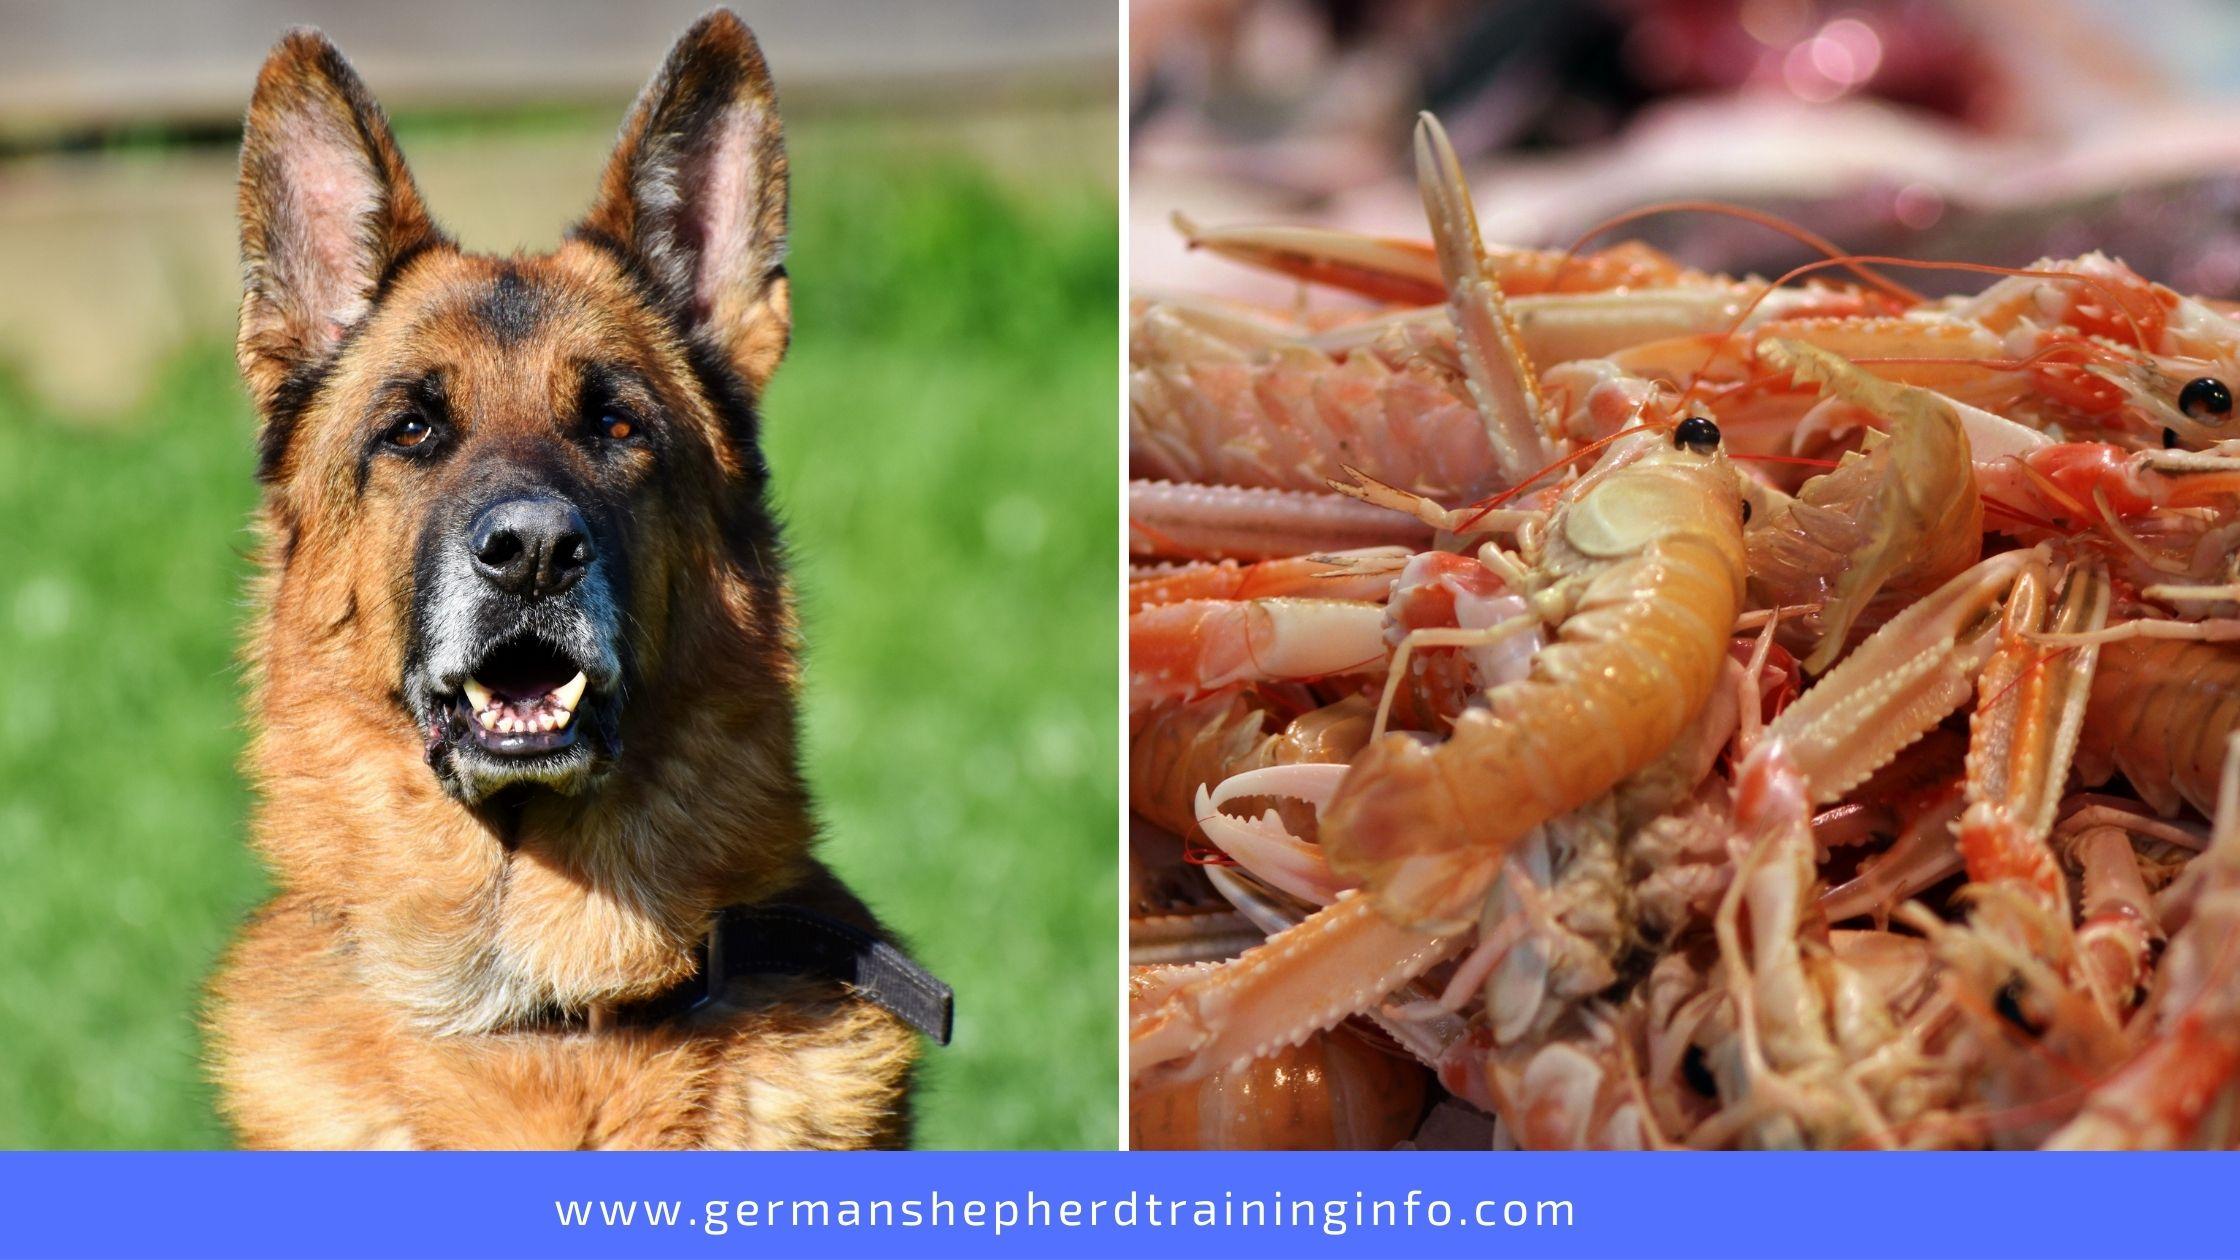 Can German Shepherds Eat Shrimp?